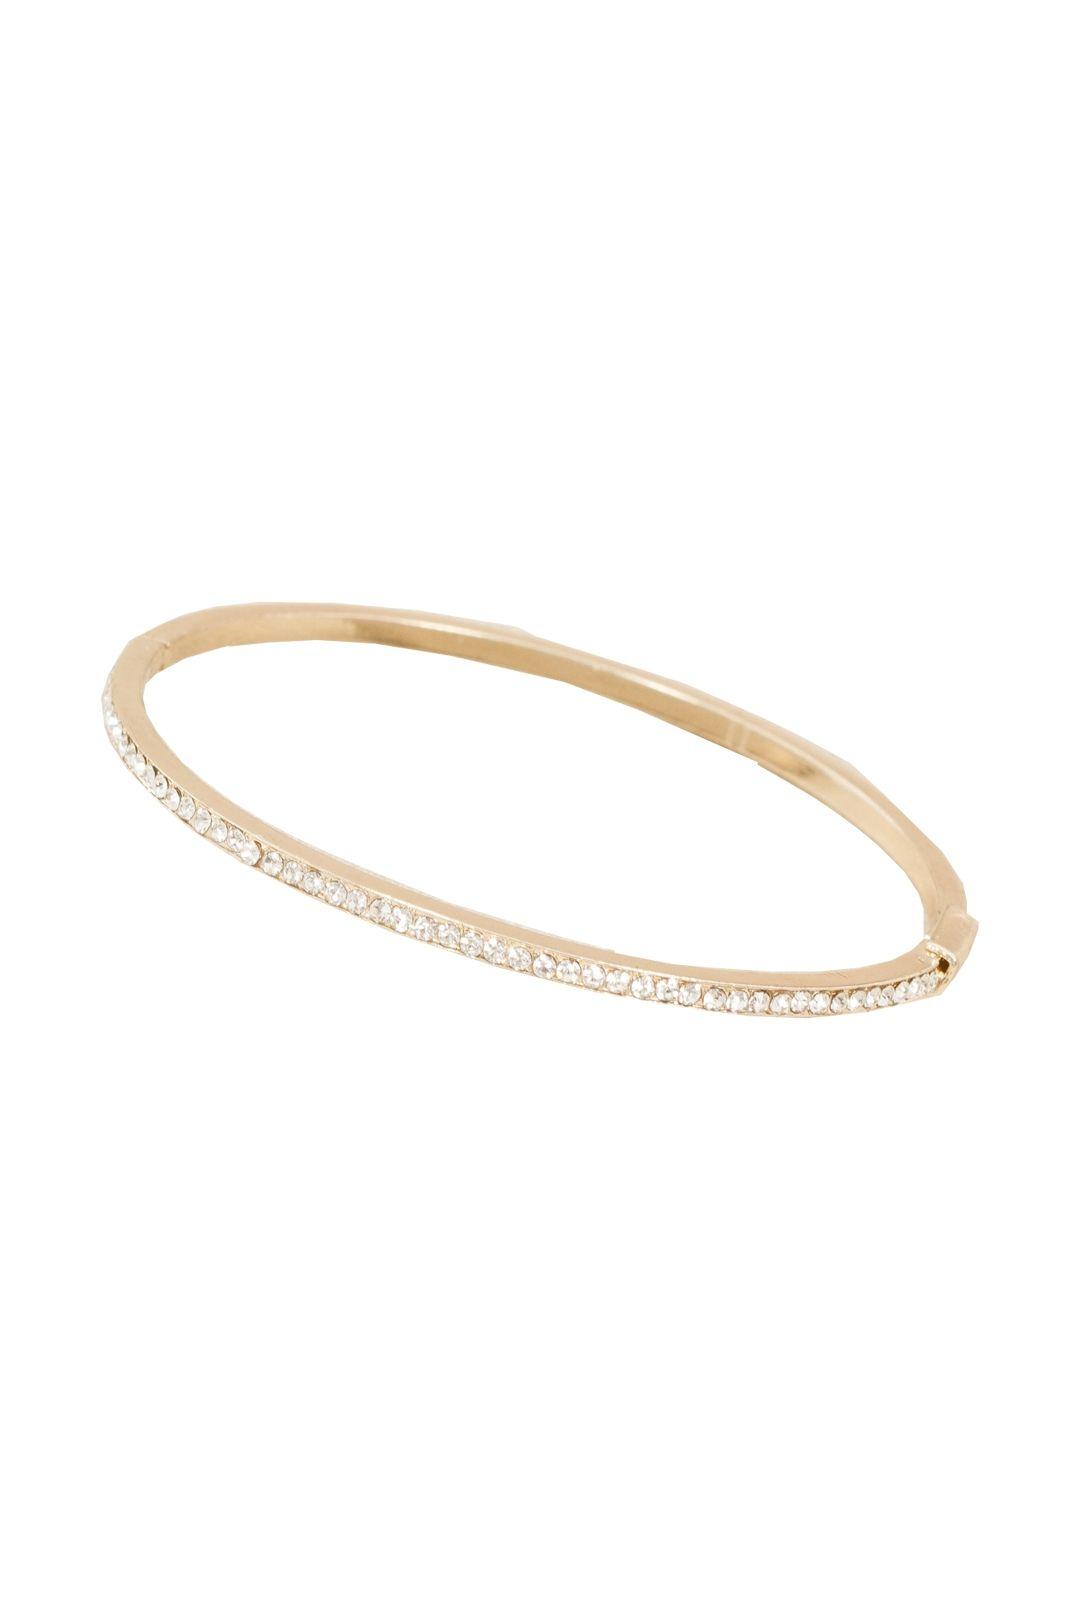 Adorne - Super Fine Diamante Hinge Bracelet - Gold - Front